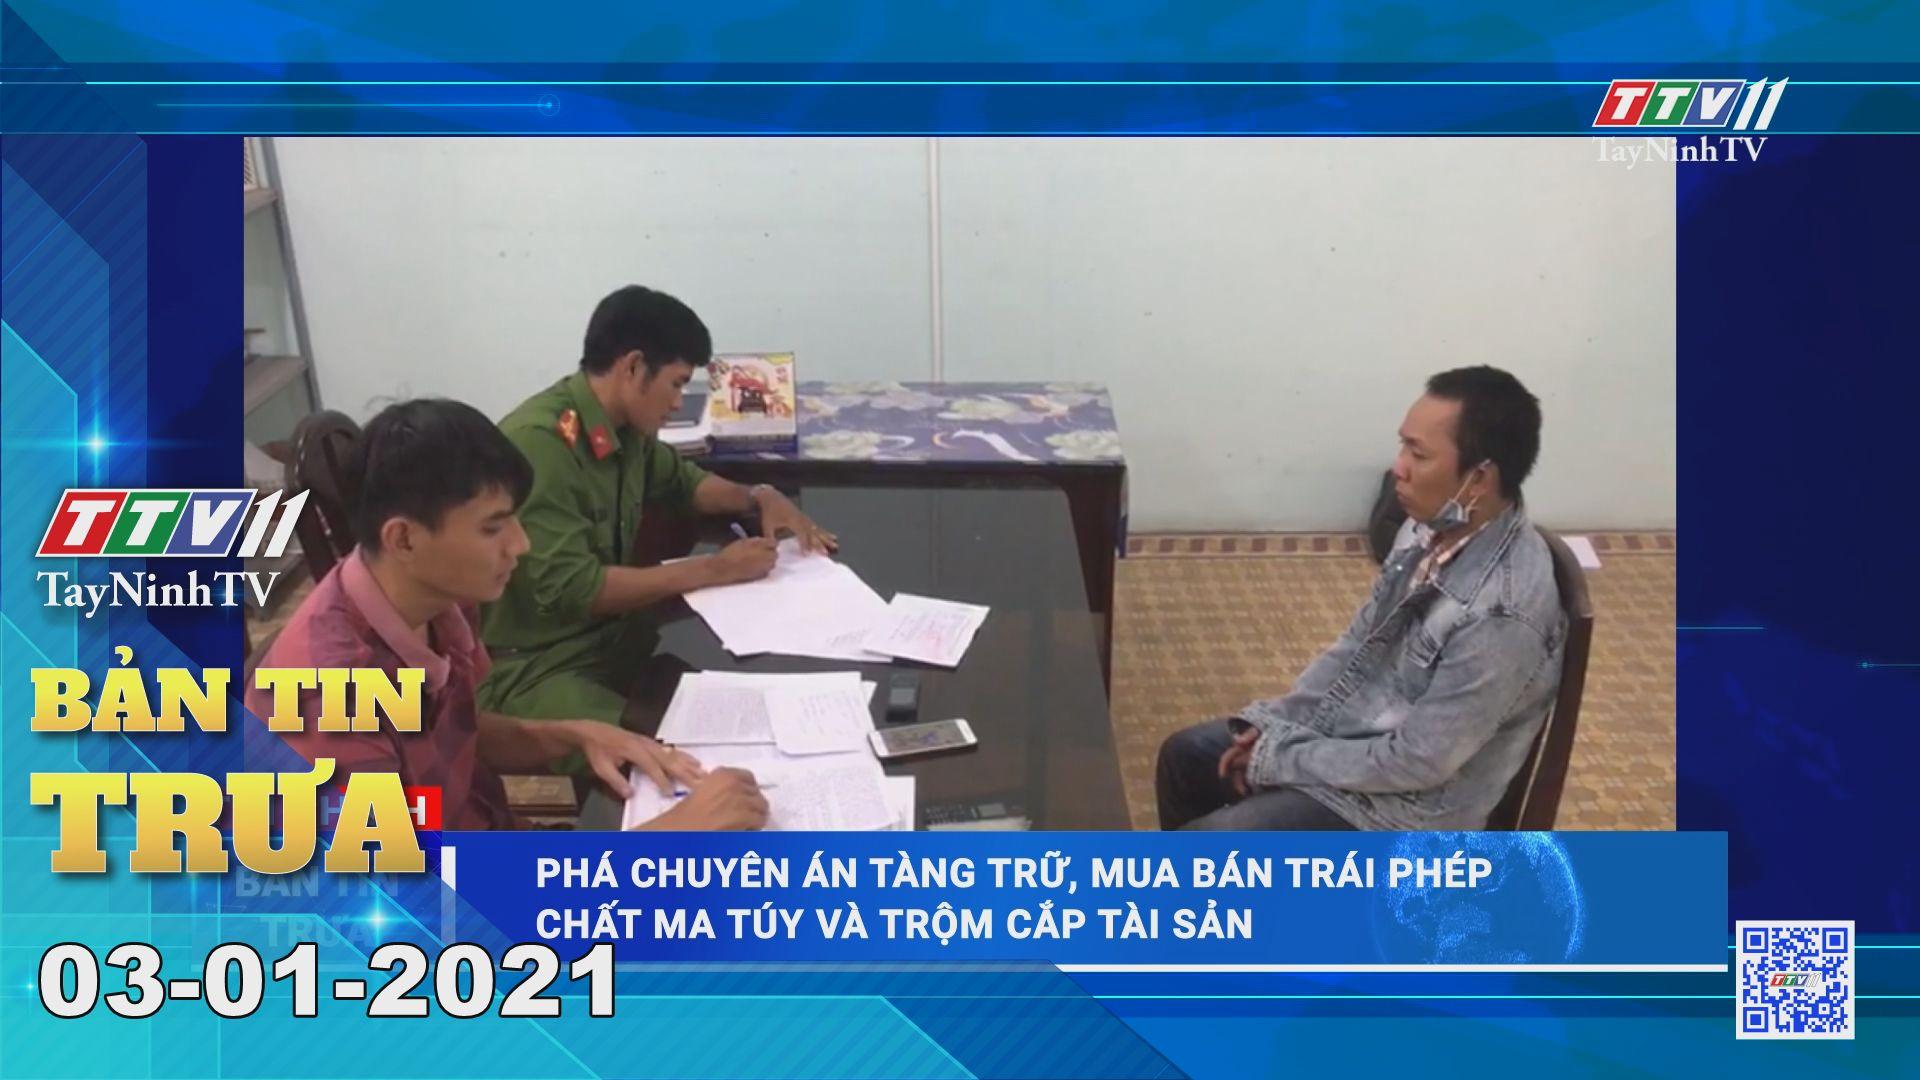 Bản tin trưa 03-01-2021 | Tin tức hôm nay | TayNinhTV